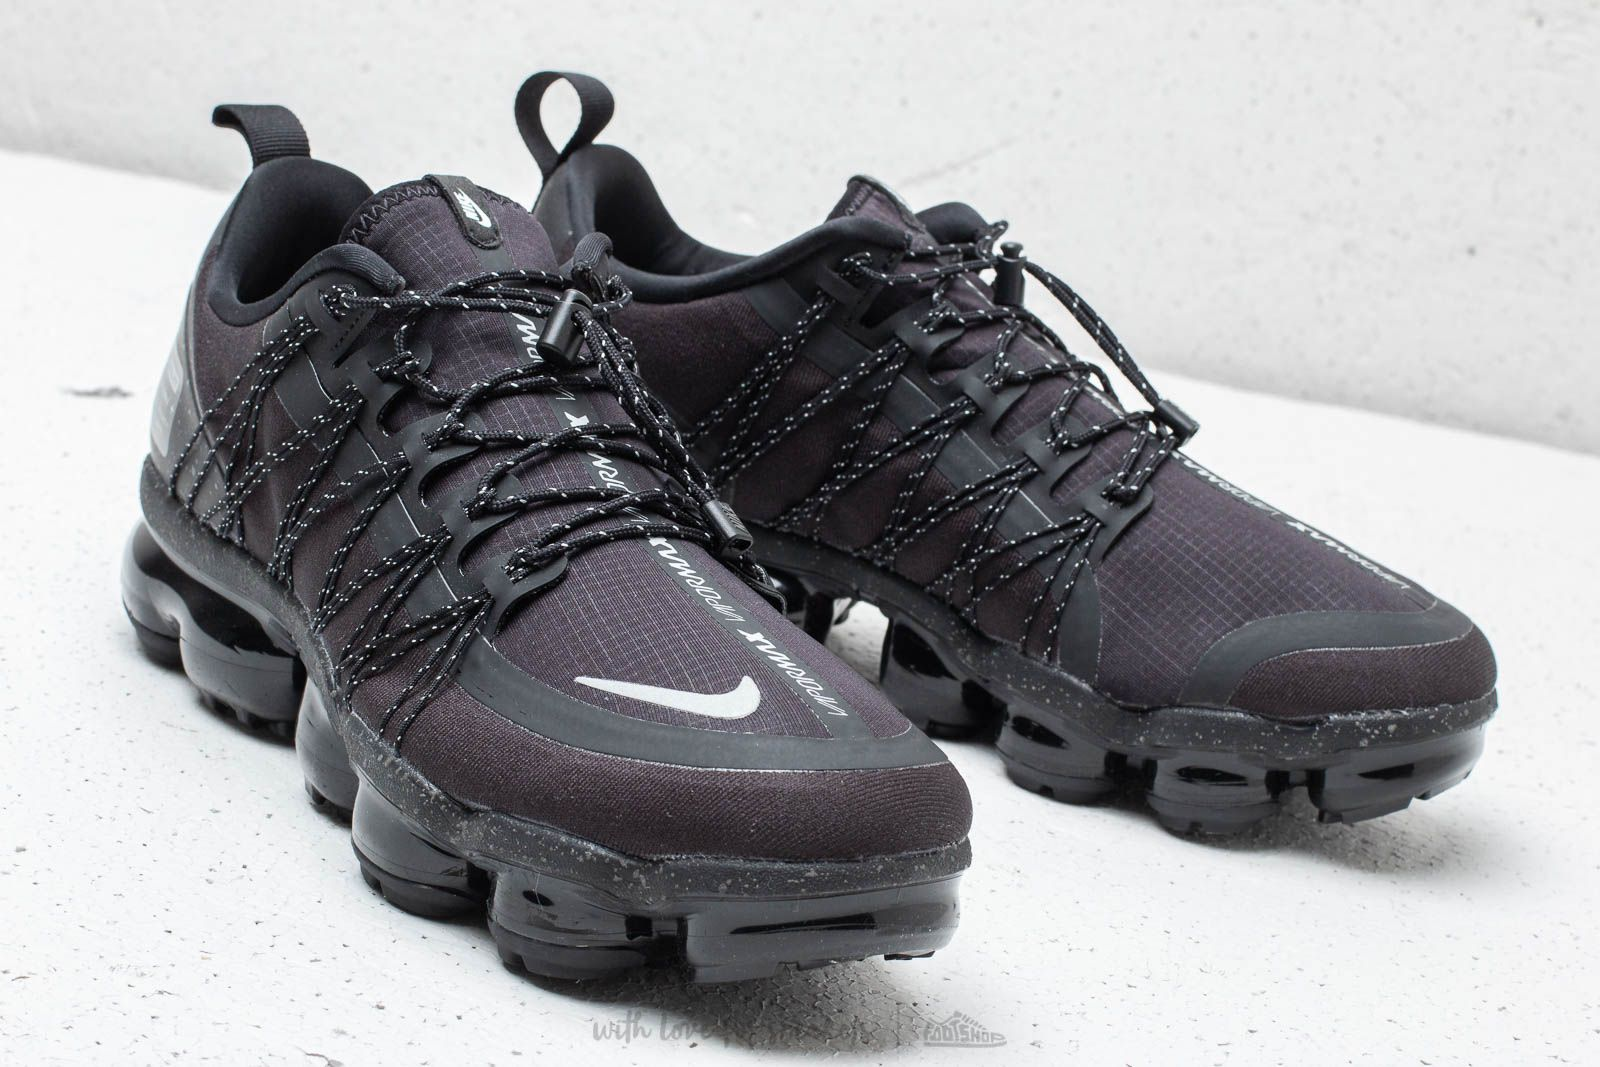 check out 779ea 4bcda Nike Air Vapormax Run Utility Black/ Reflect Silver- Black ...